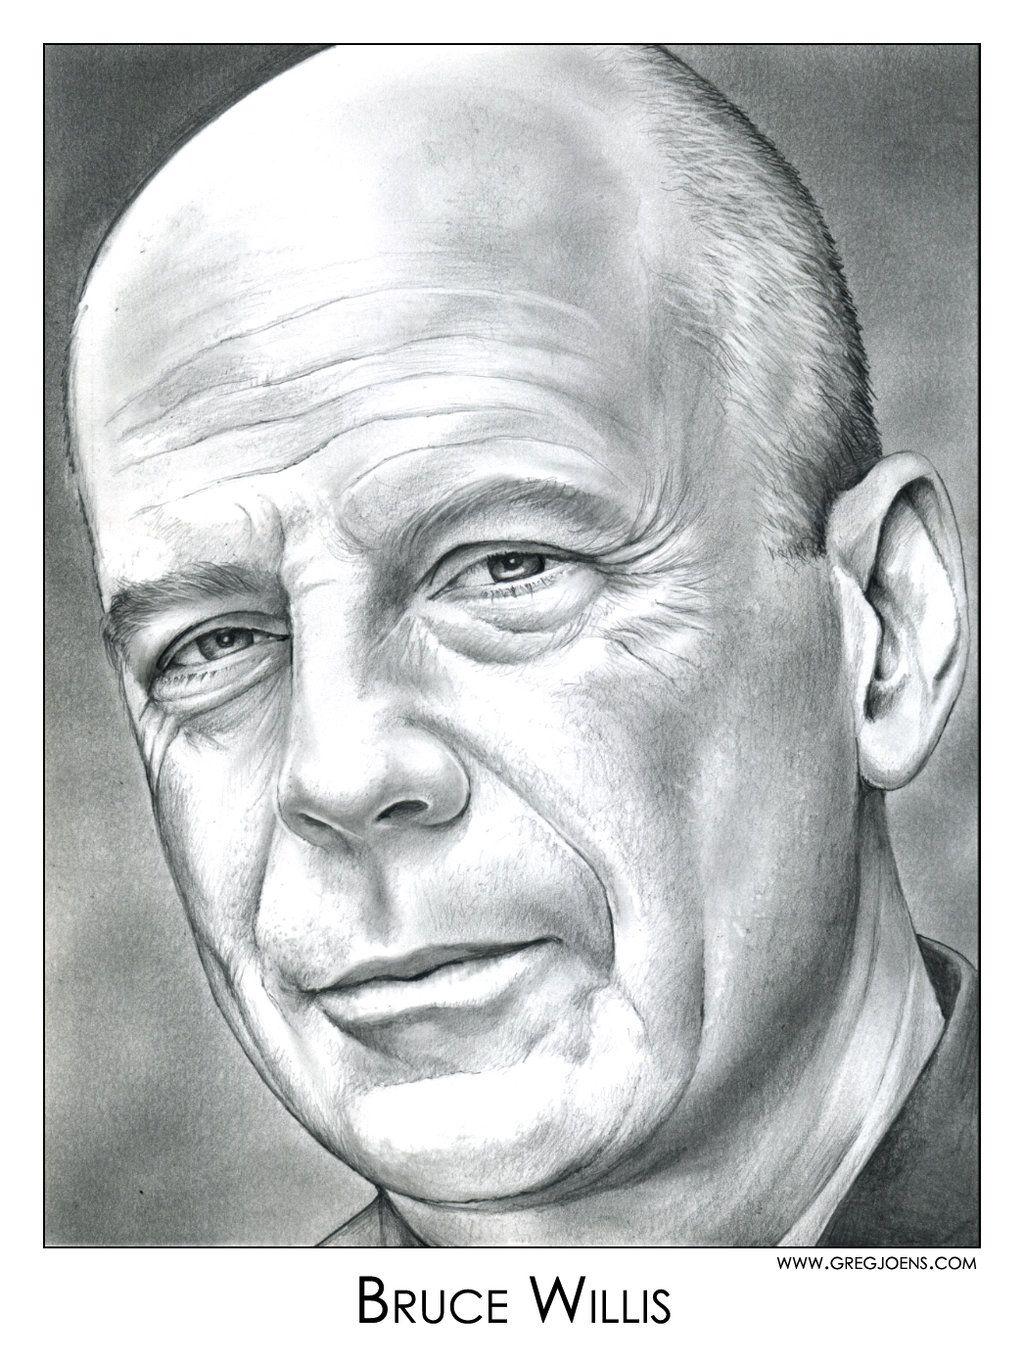 7e41a4248acaa Bruce Willis by gregchapin.deviantart.com on  deviantART